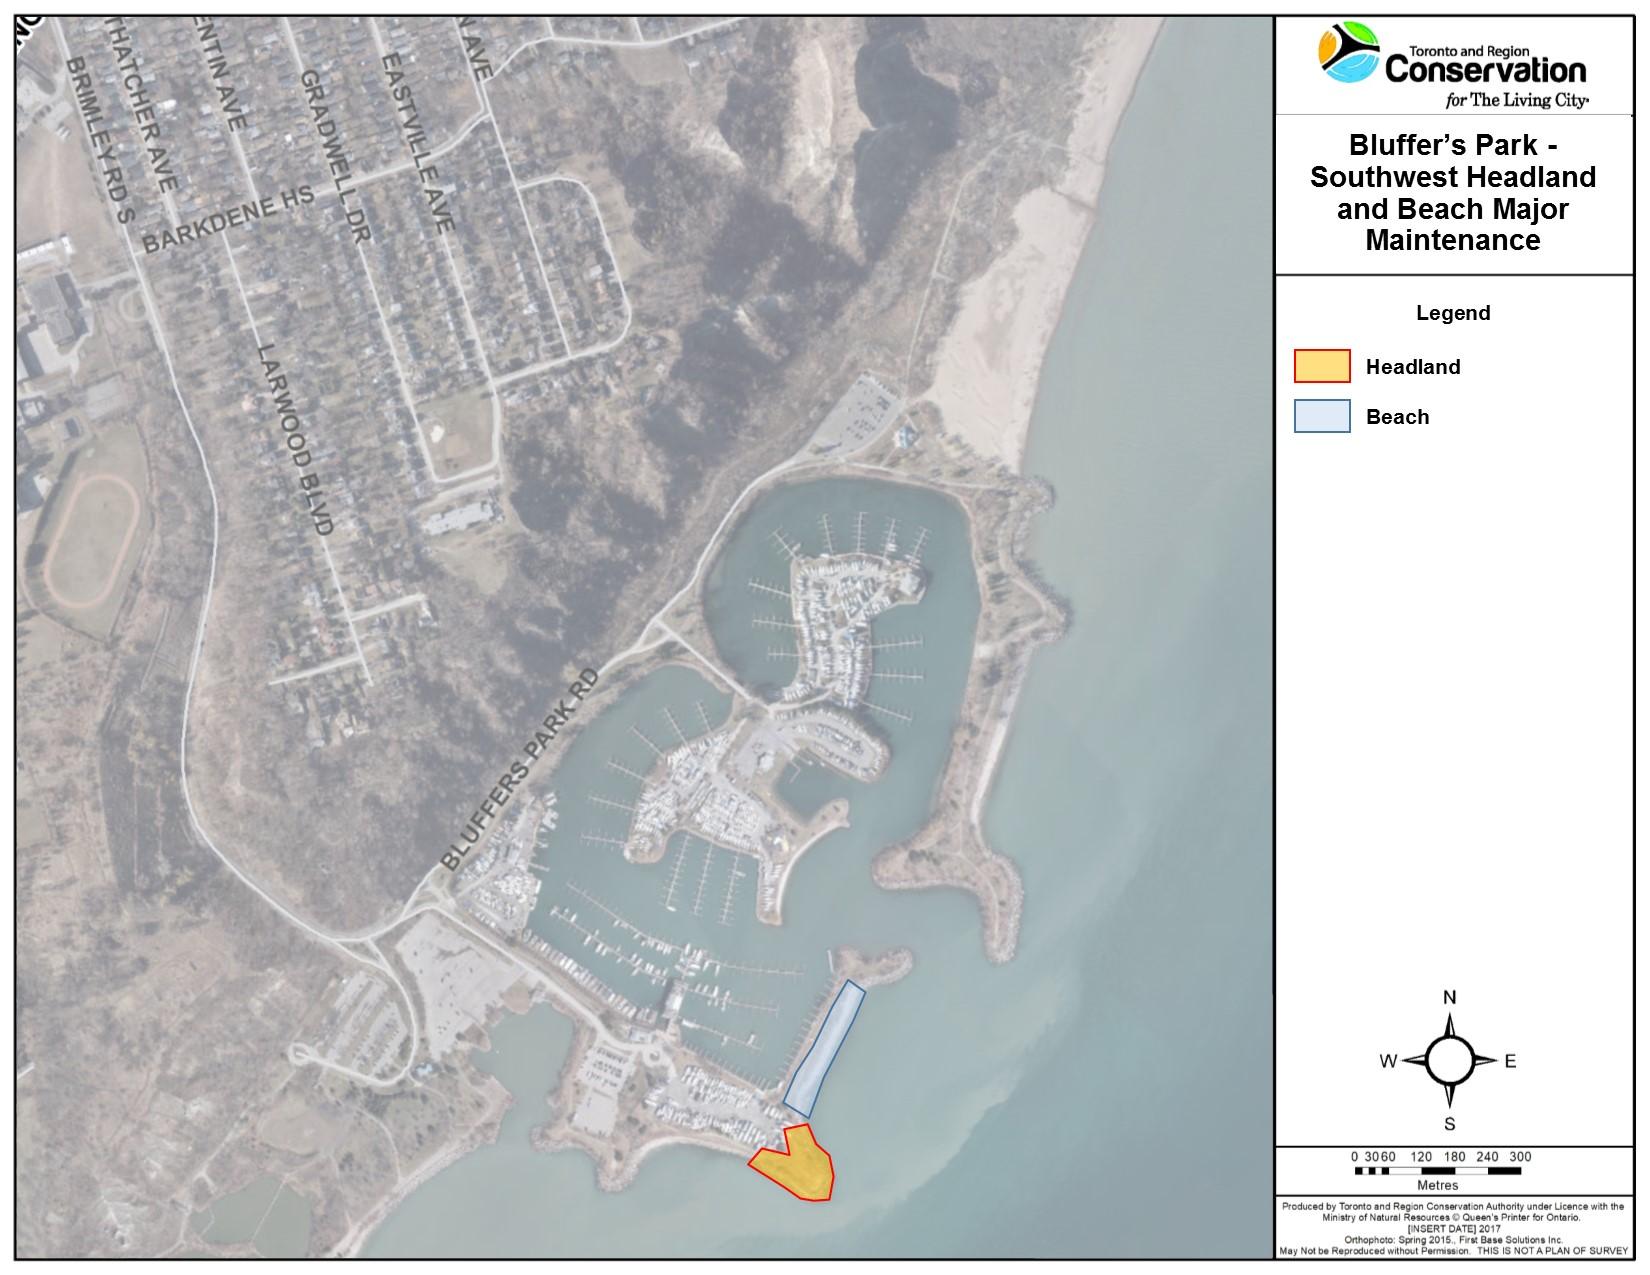 Bluffer's Park Southwest Headland and Beach Major Maintenance Project Area.